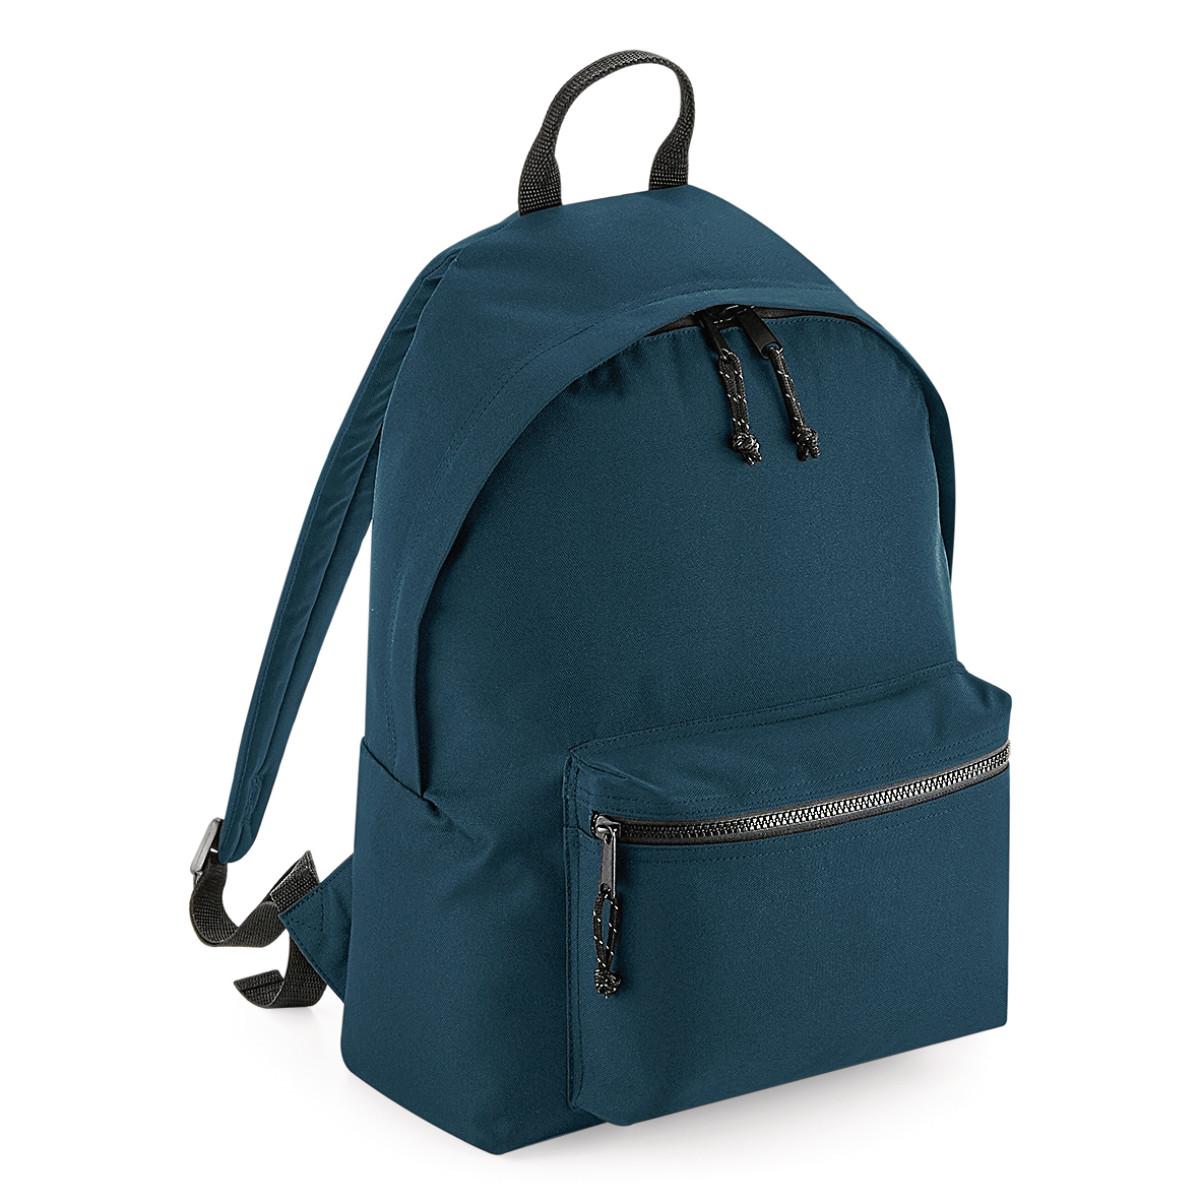 Bagbase Recycled Backpack